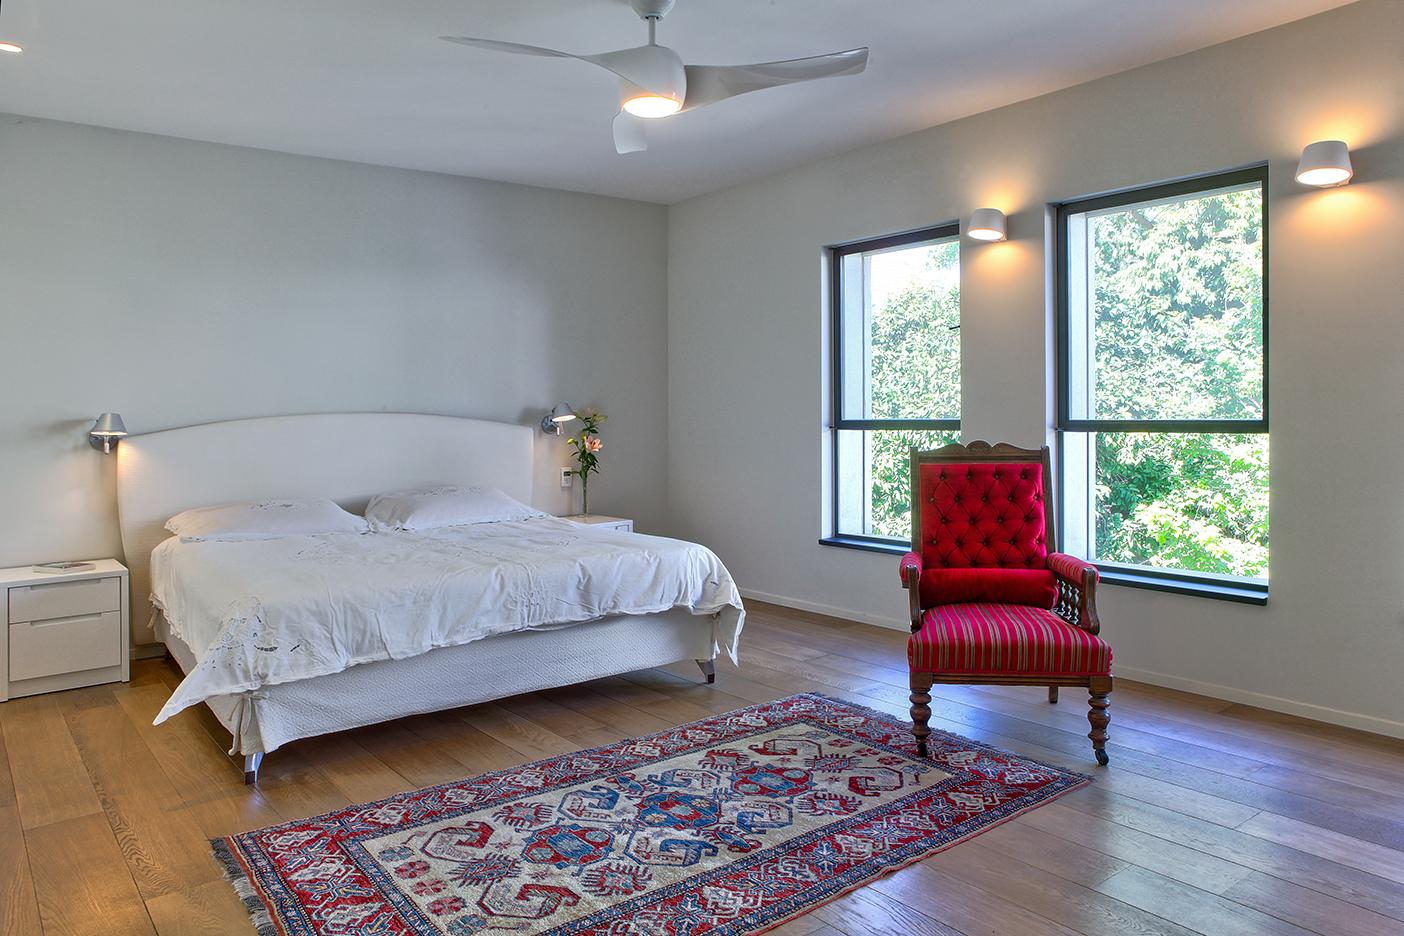 House in Ra'anana - Bedroom 1